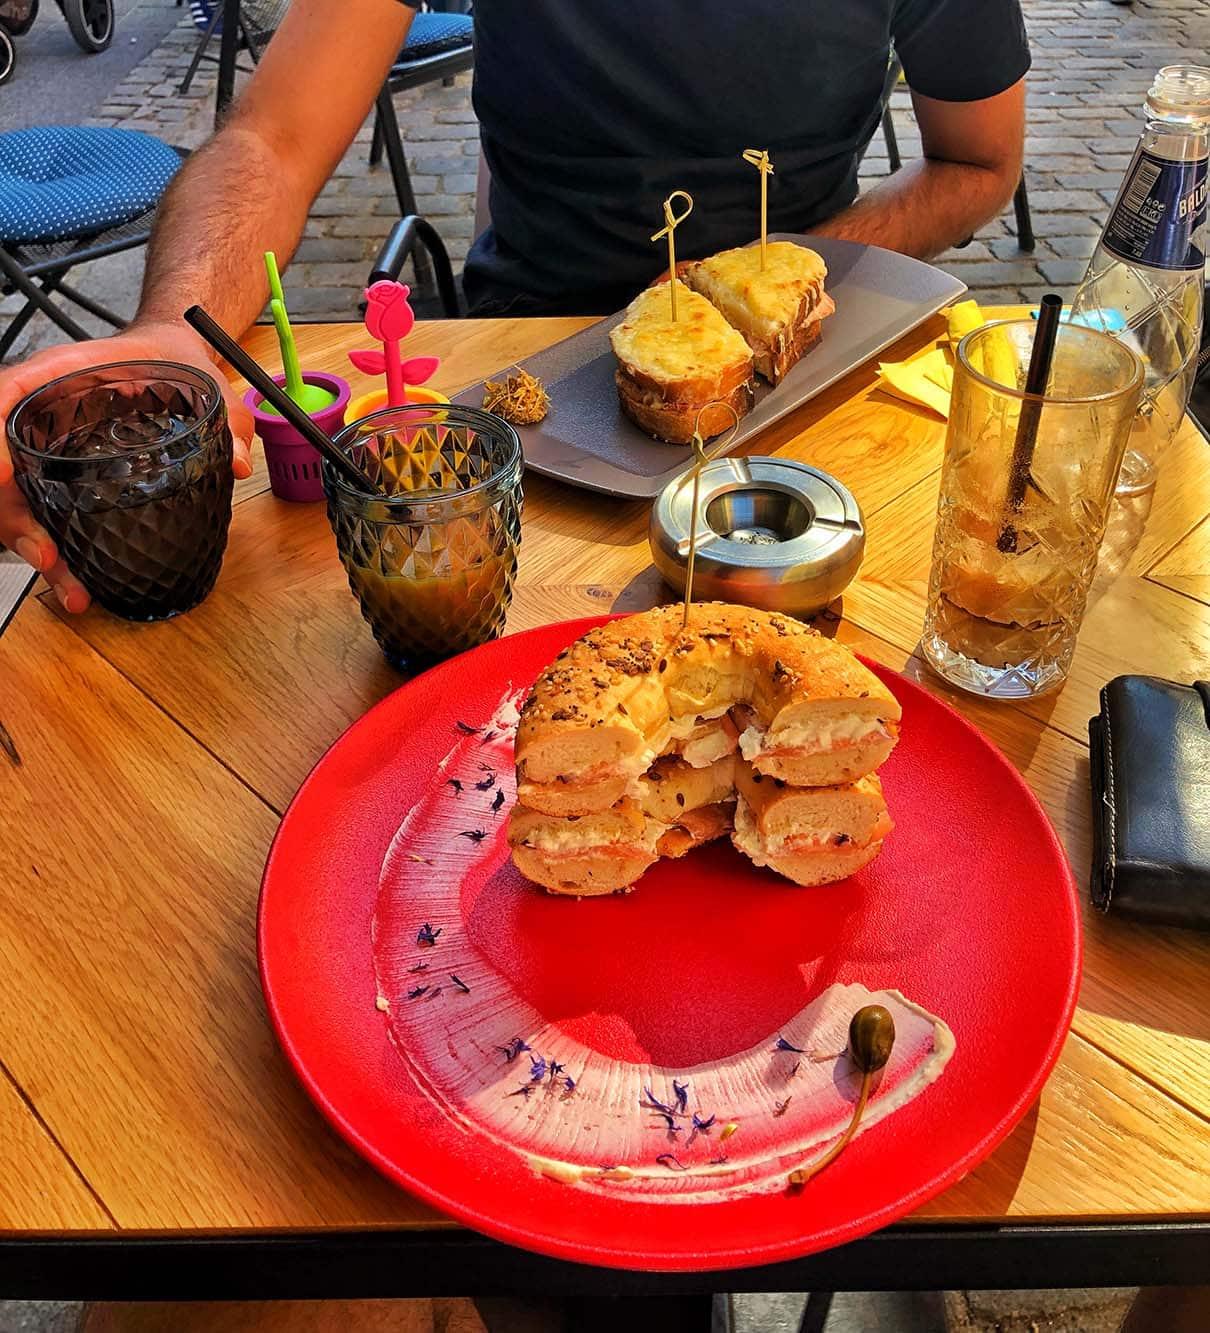 plovdiv brunch experience